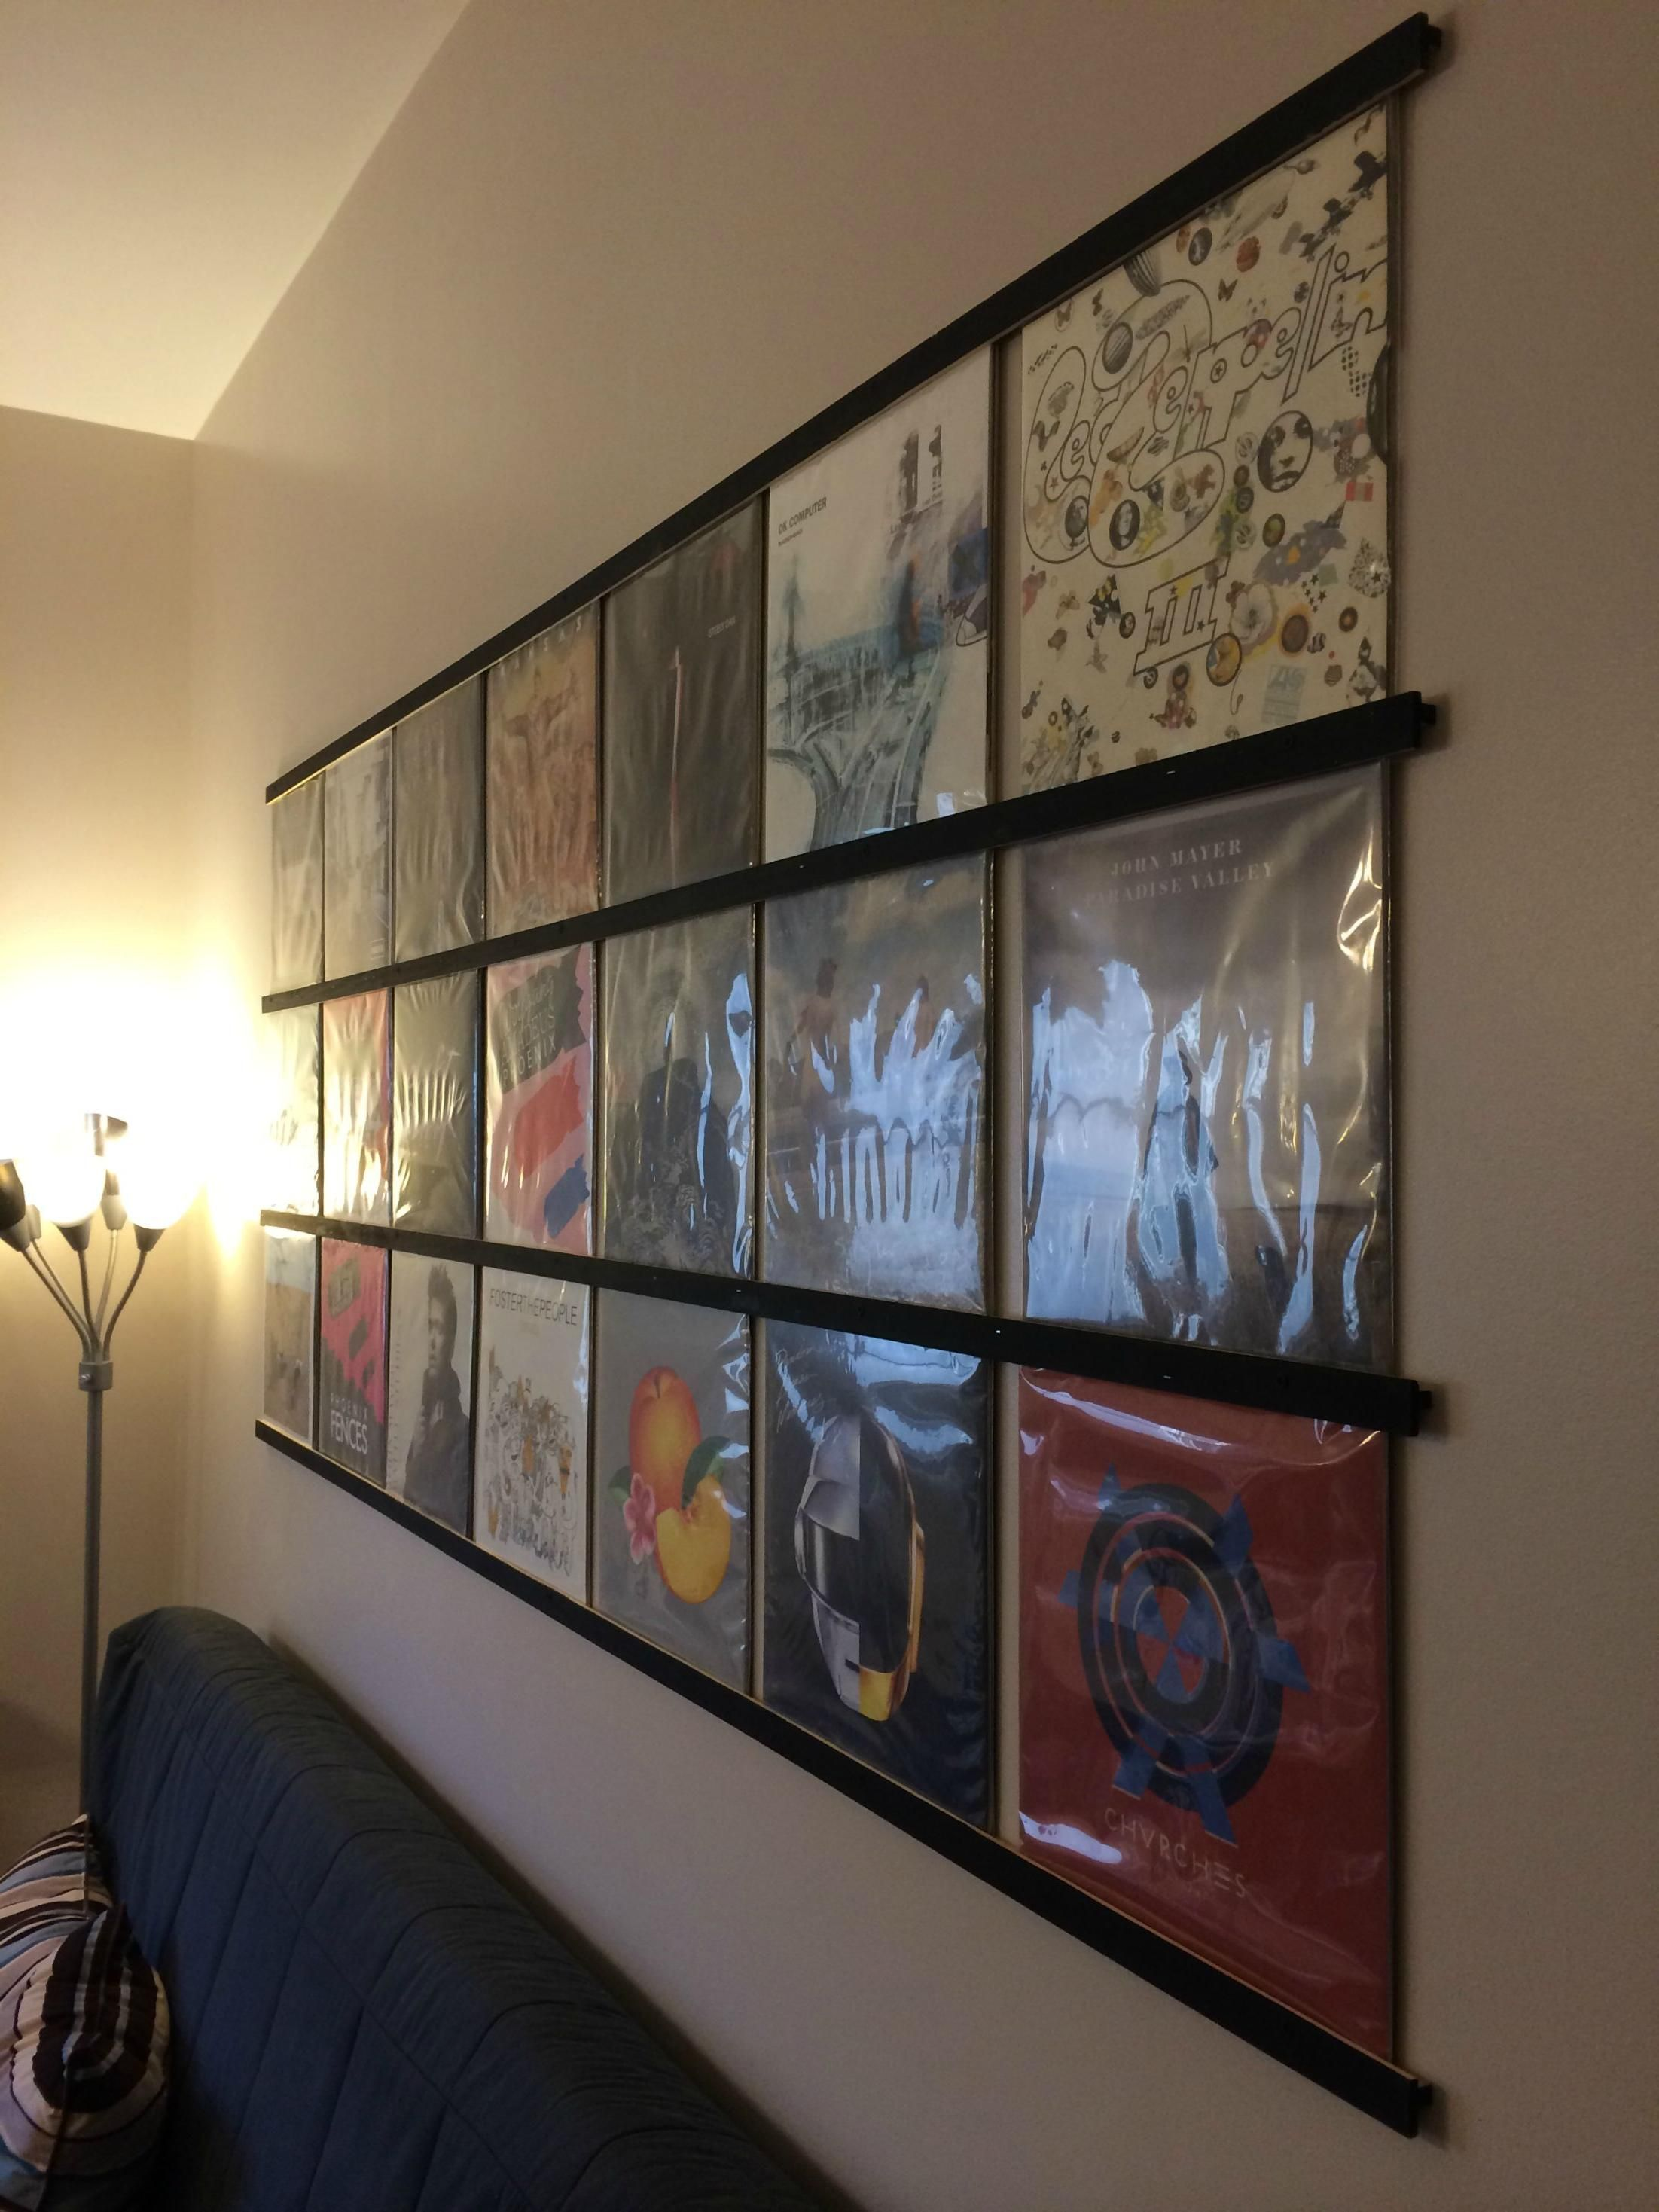 Staggering Display Vinyl Records On Wall Vinyl Storage Record Room Dj Room